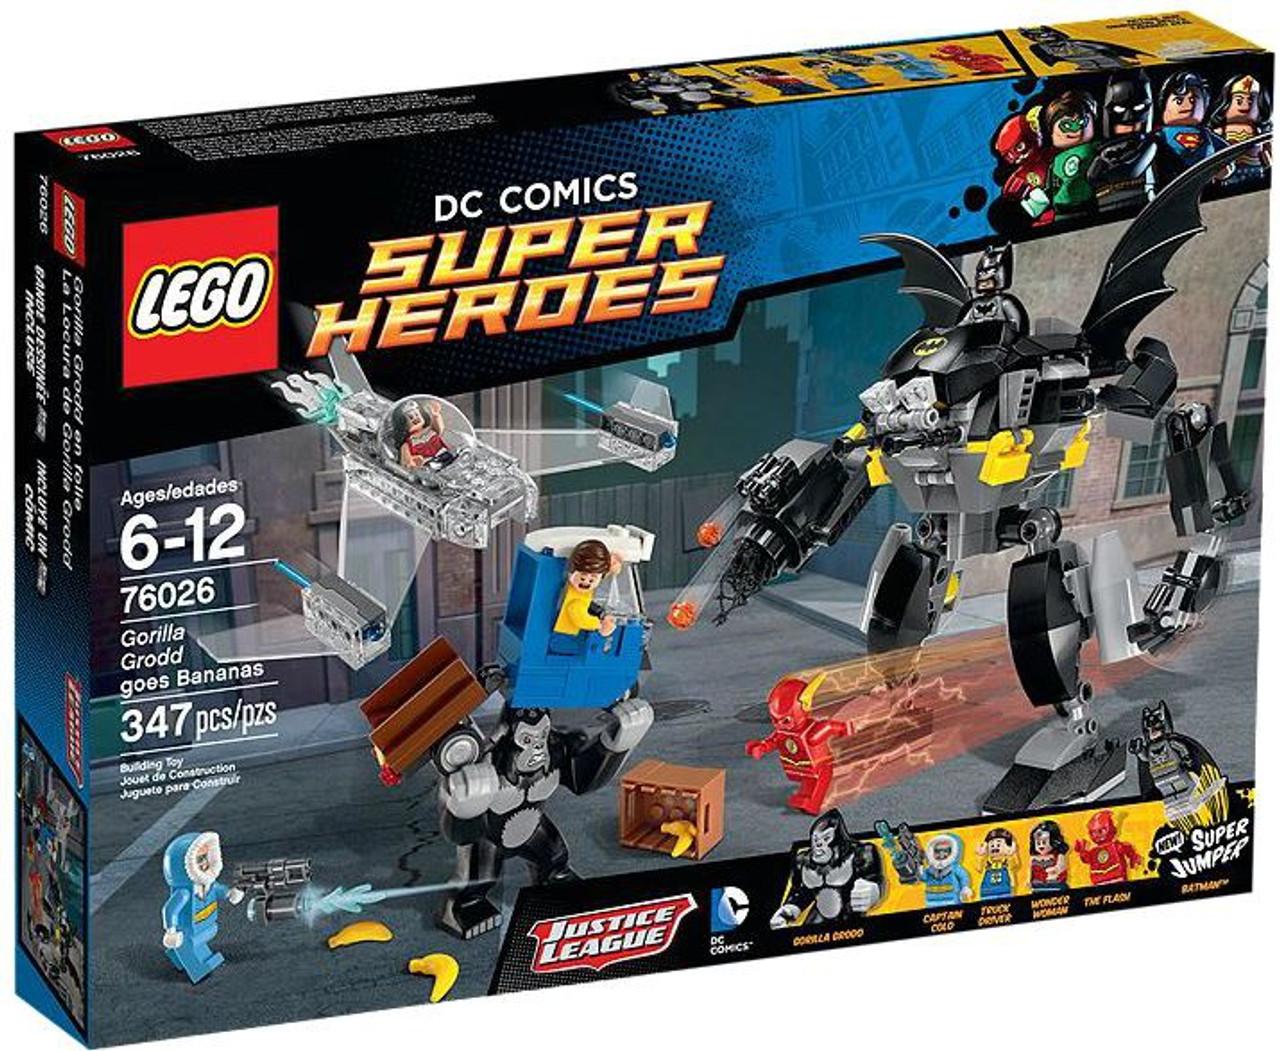 Lego Dc Super Heroes Gorilla Grodd Goes Bananas Set 76026 Toywiz